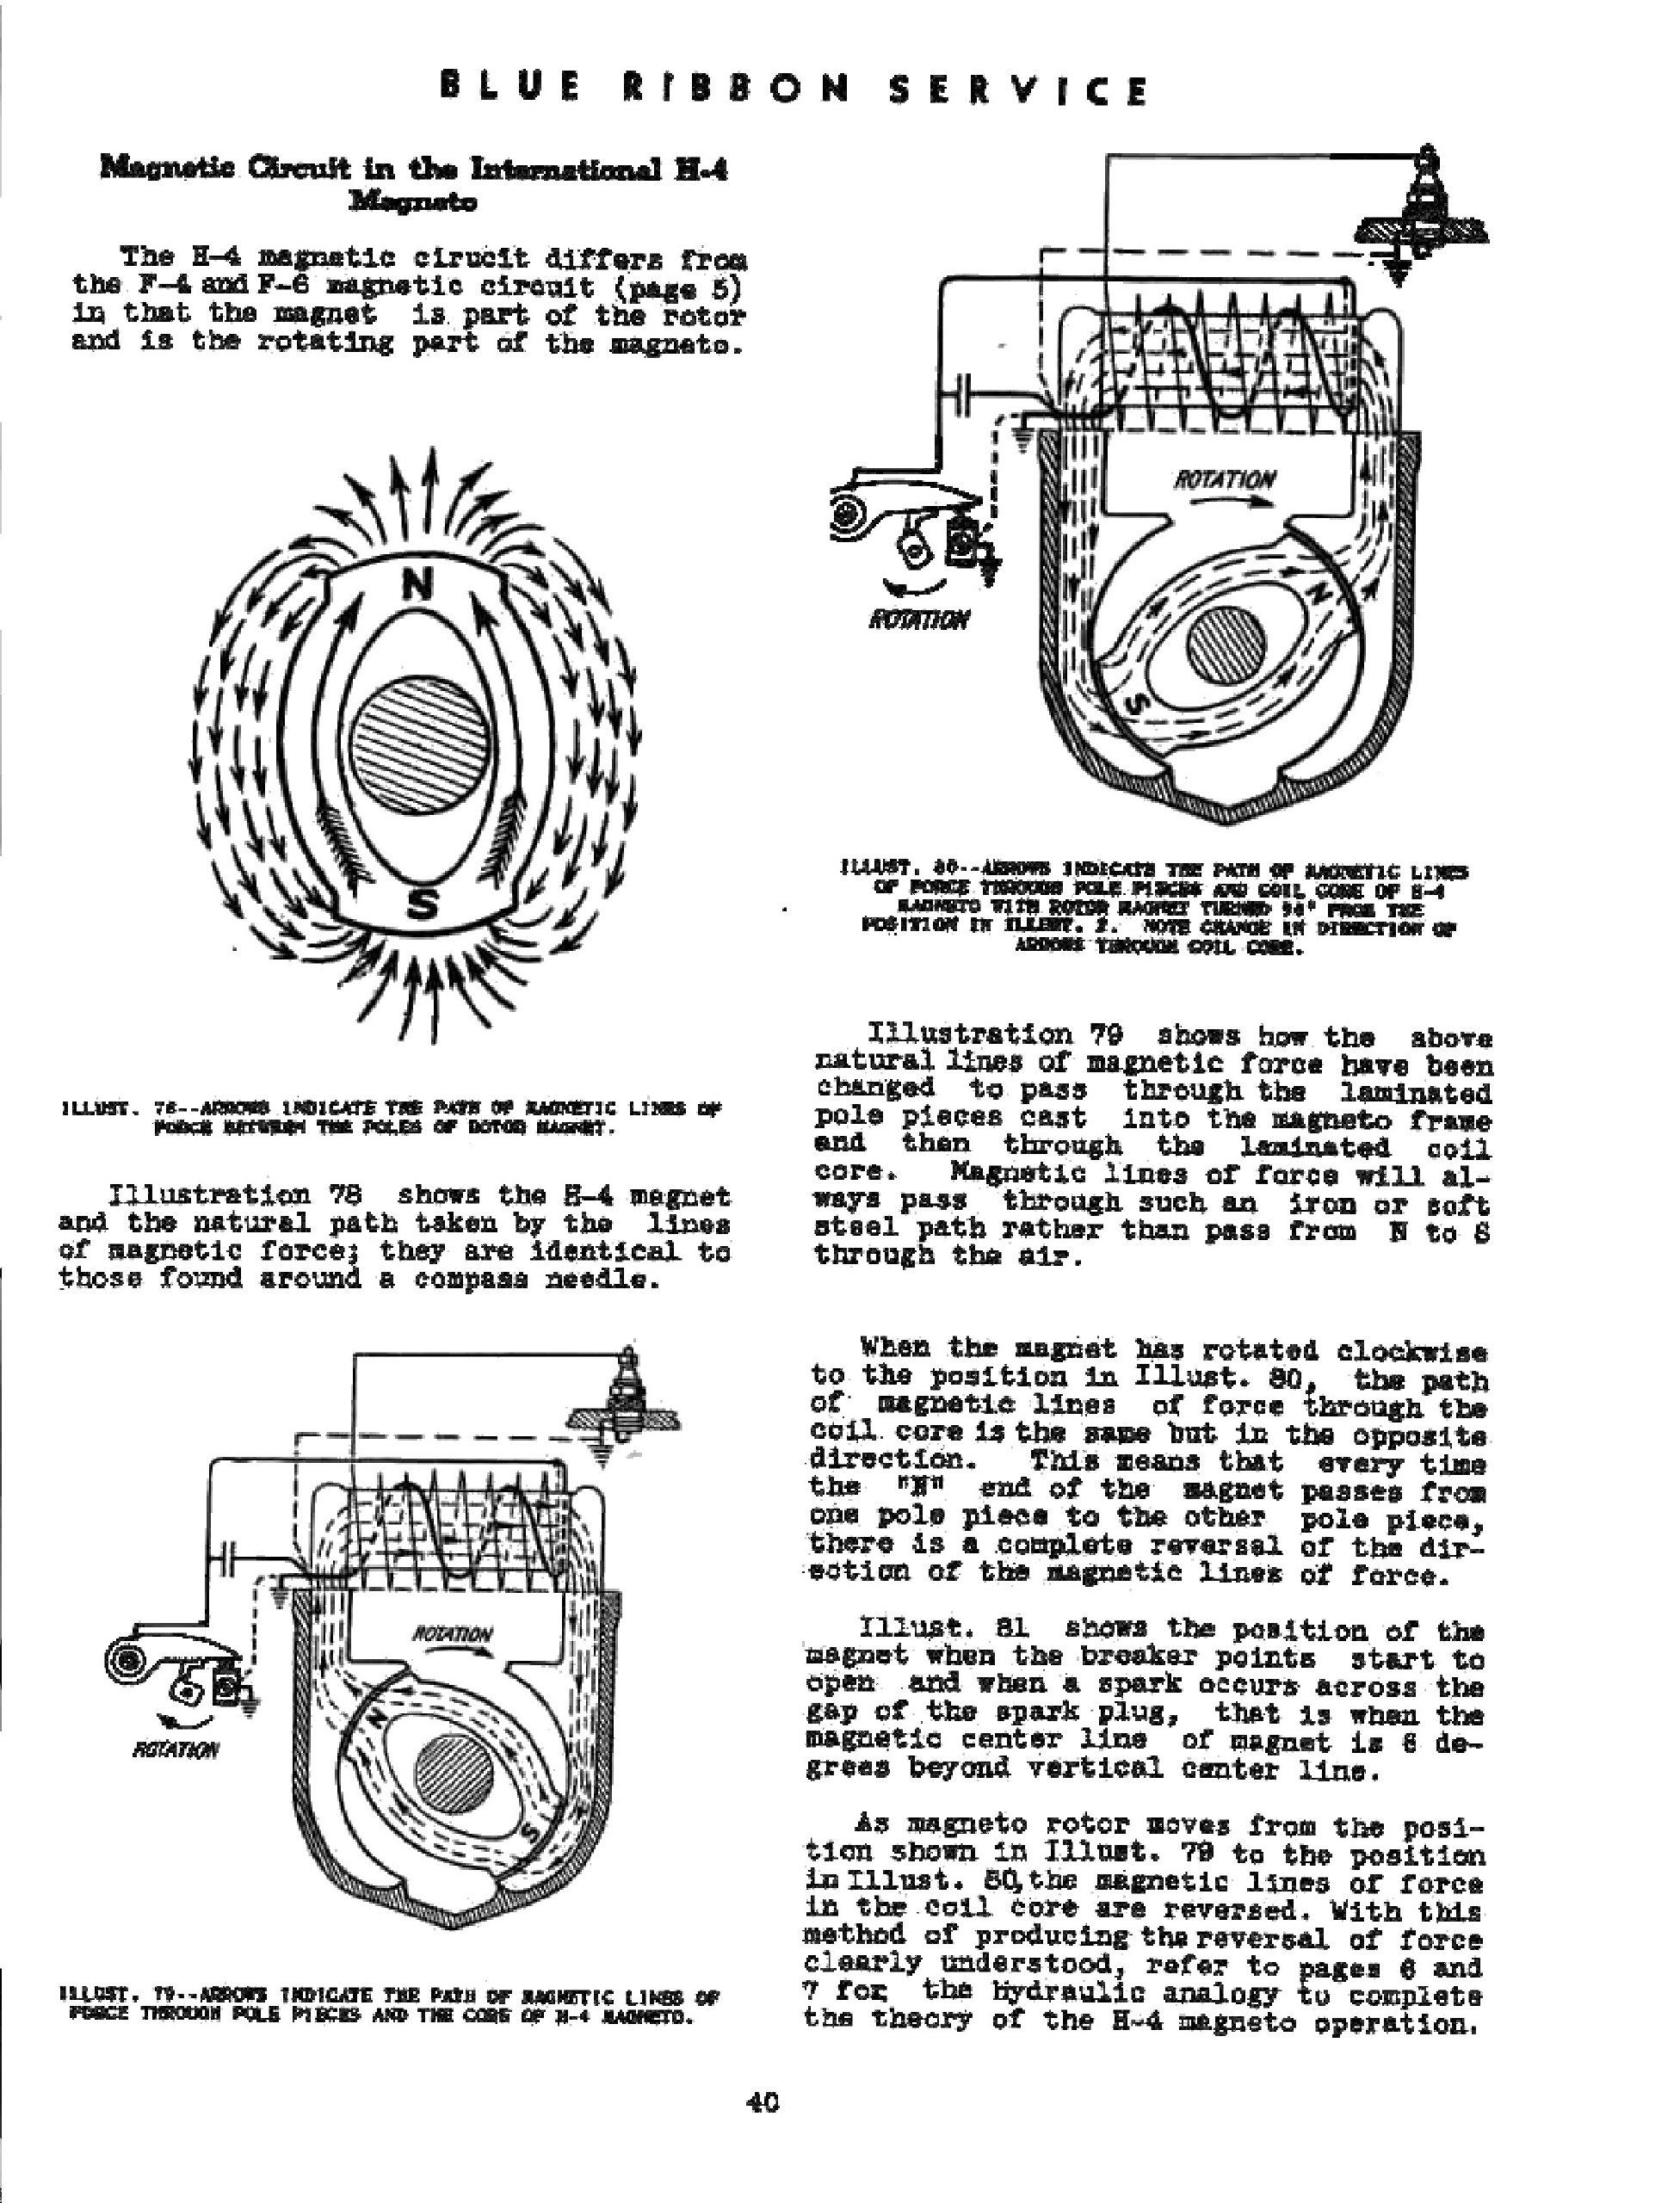 International Harvester Gss-5035 Magnetos Service Manual: IH